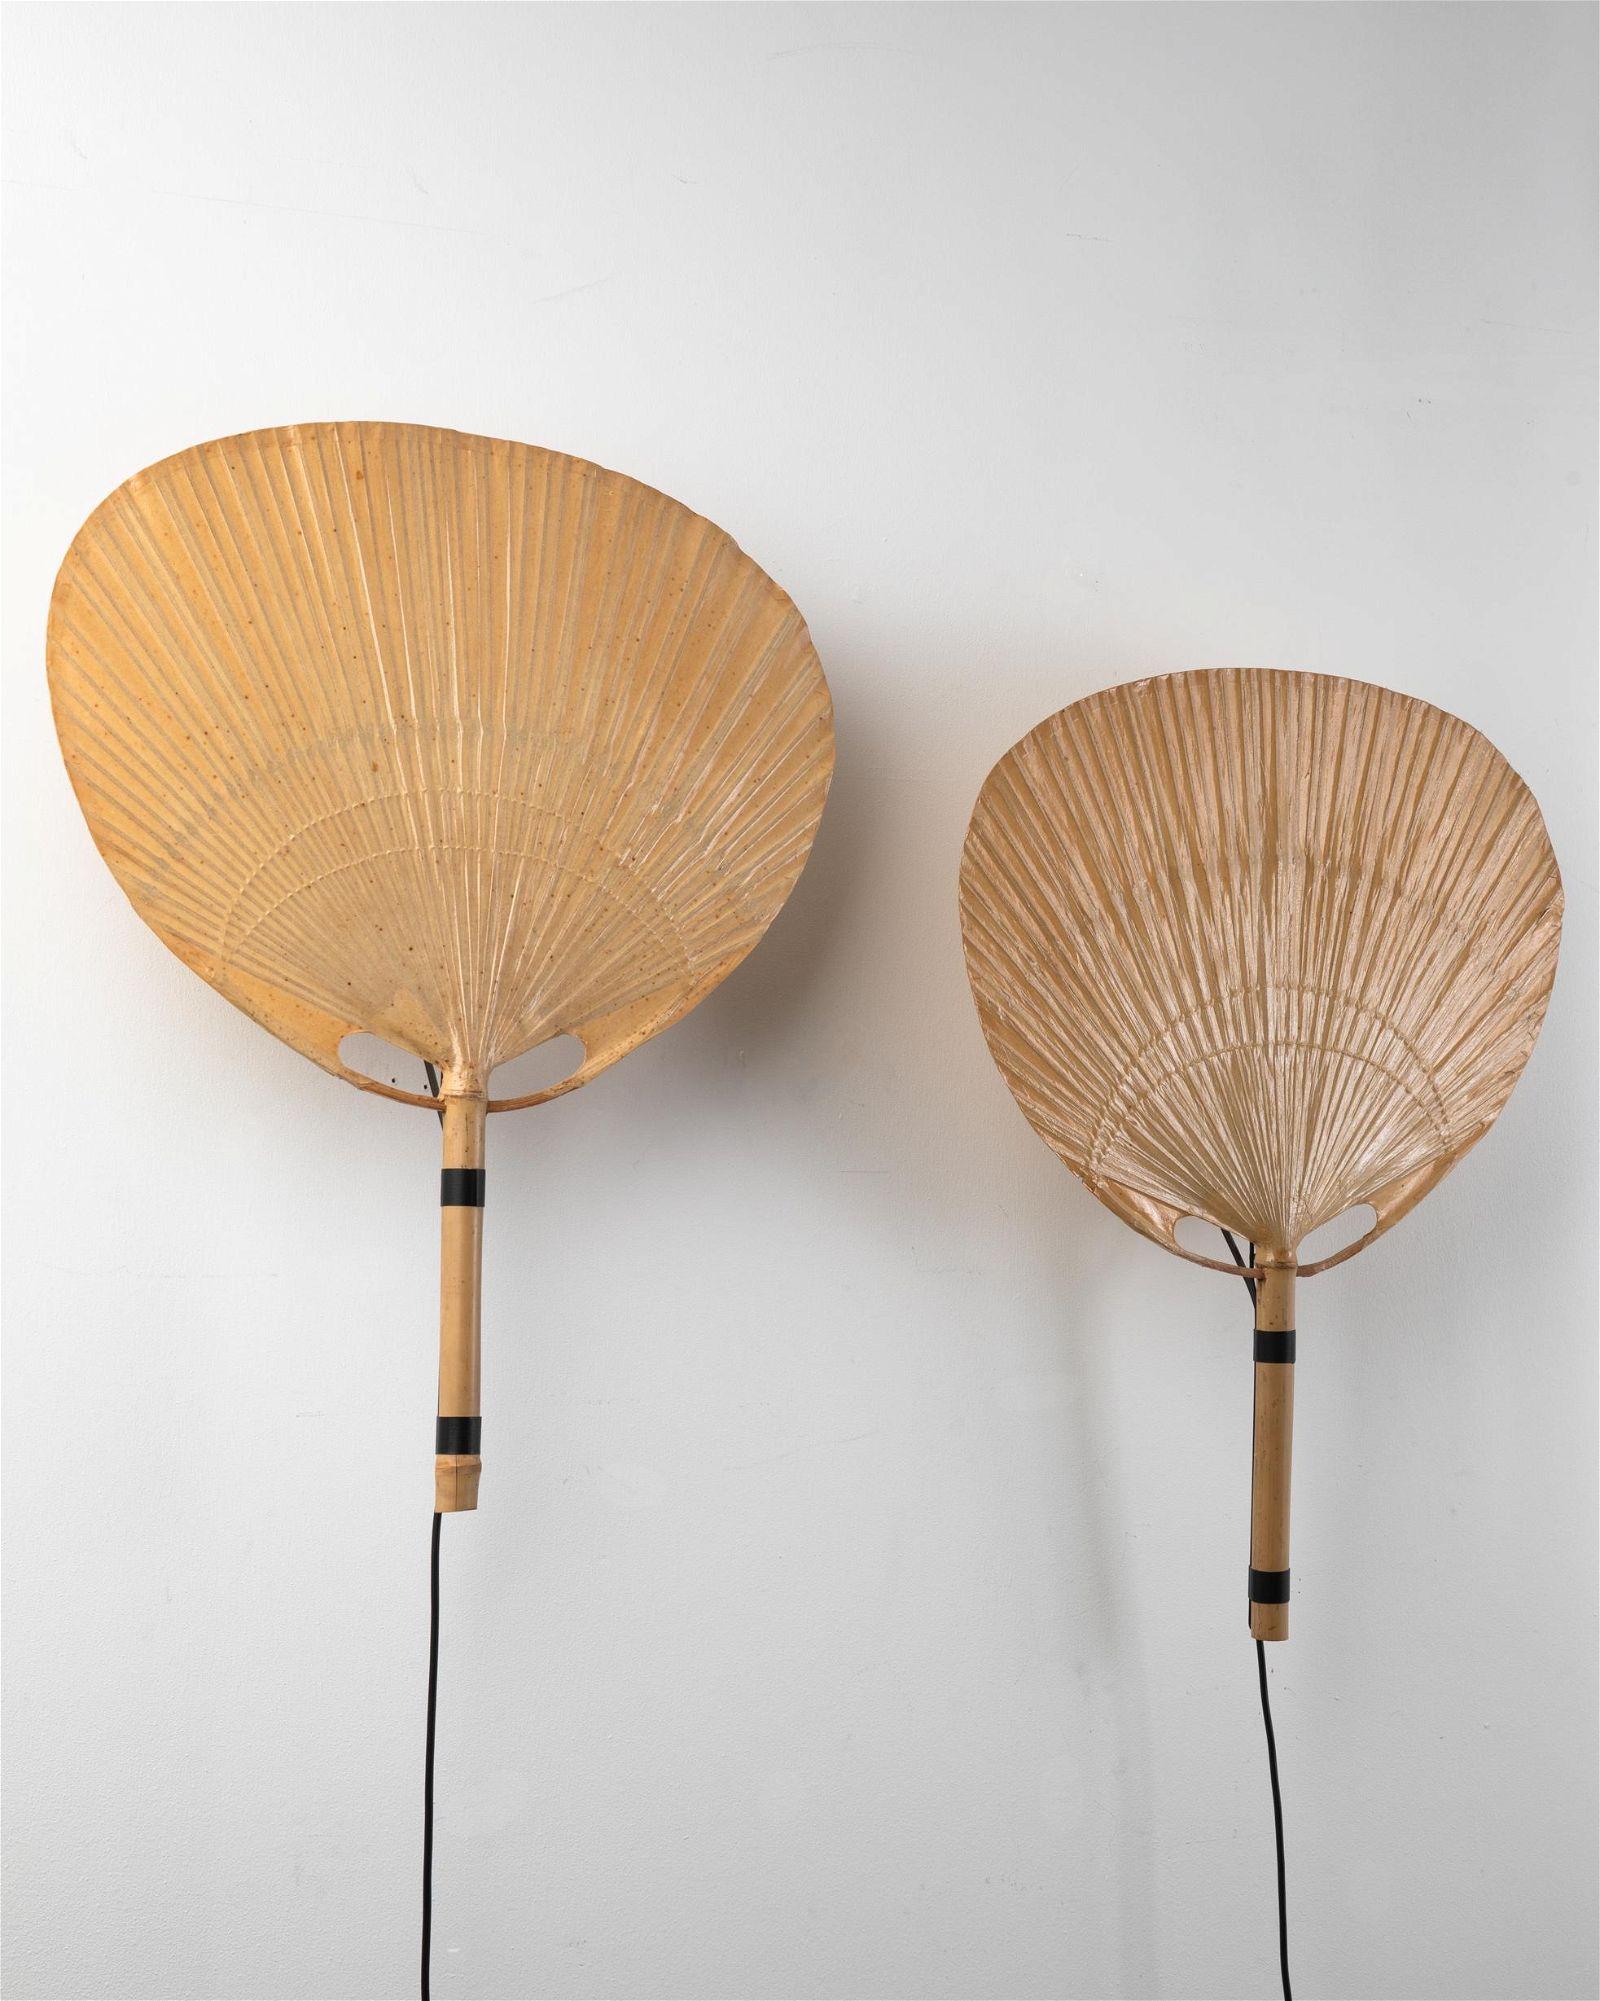 Ingo Maurer, Design M, 2 Wall Lamps Uchiwa